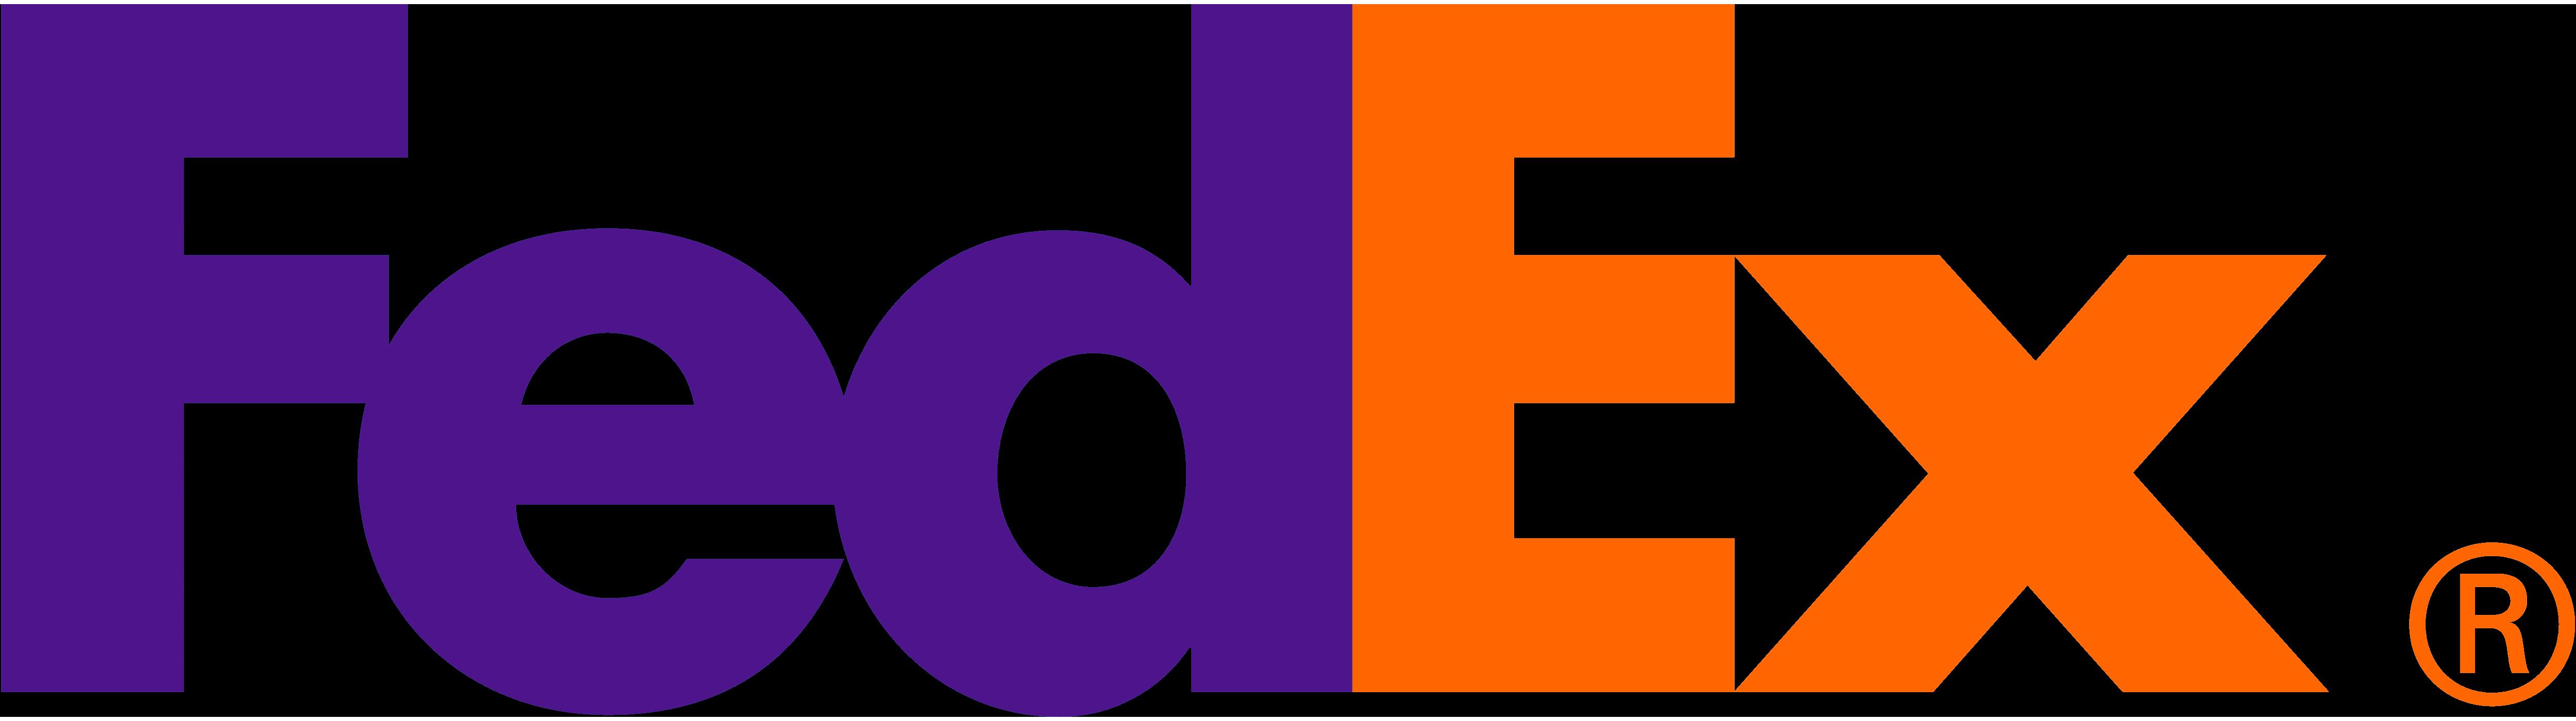 FedEx Logo Wallpaper